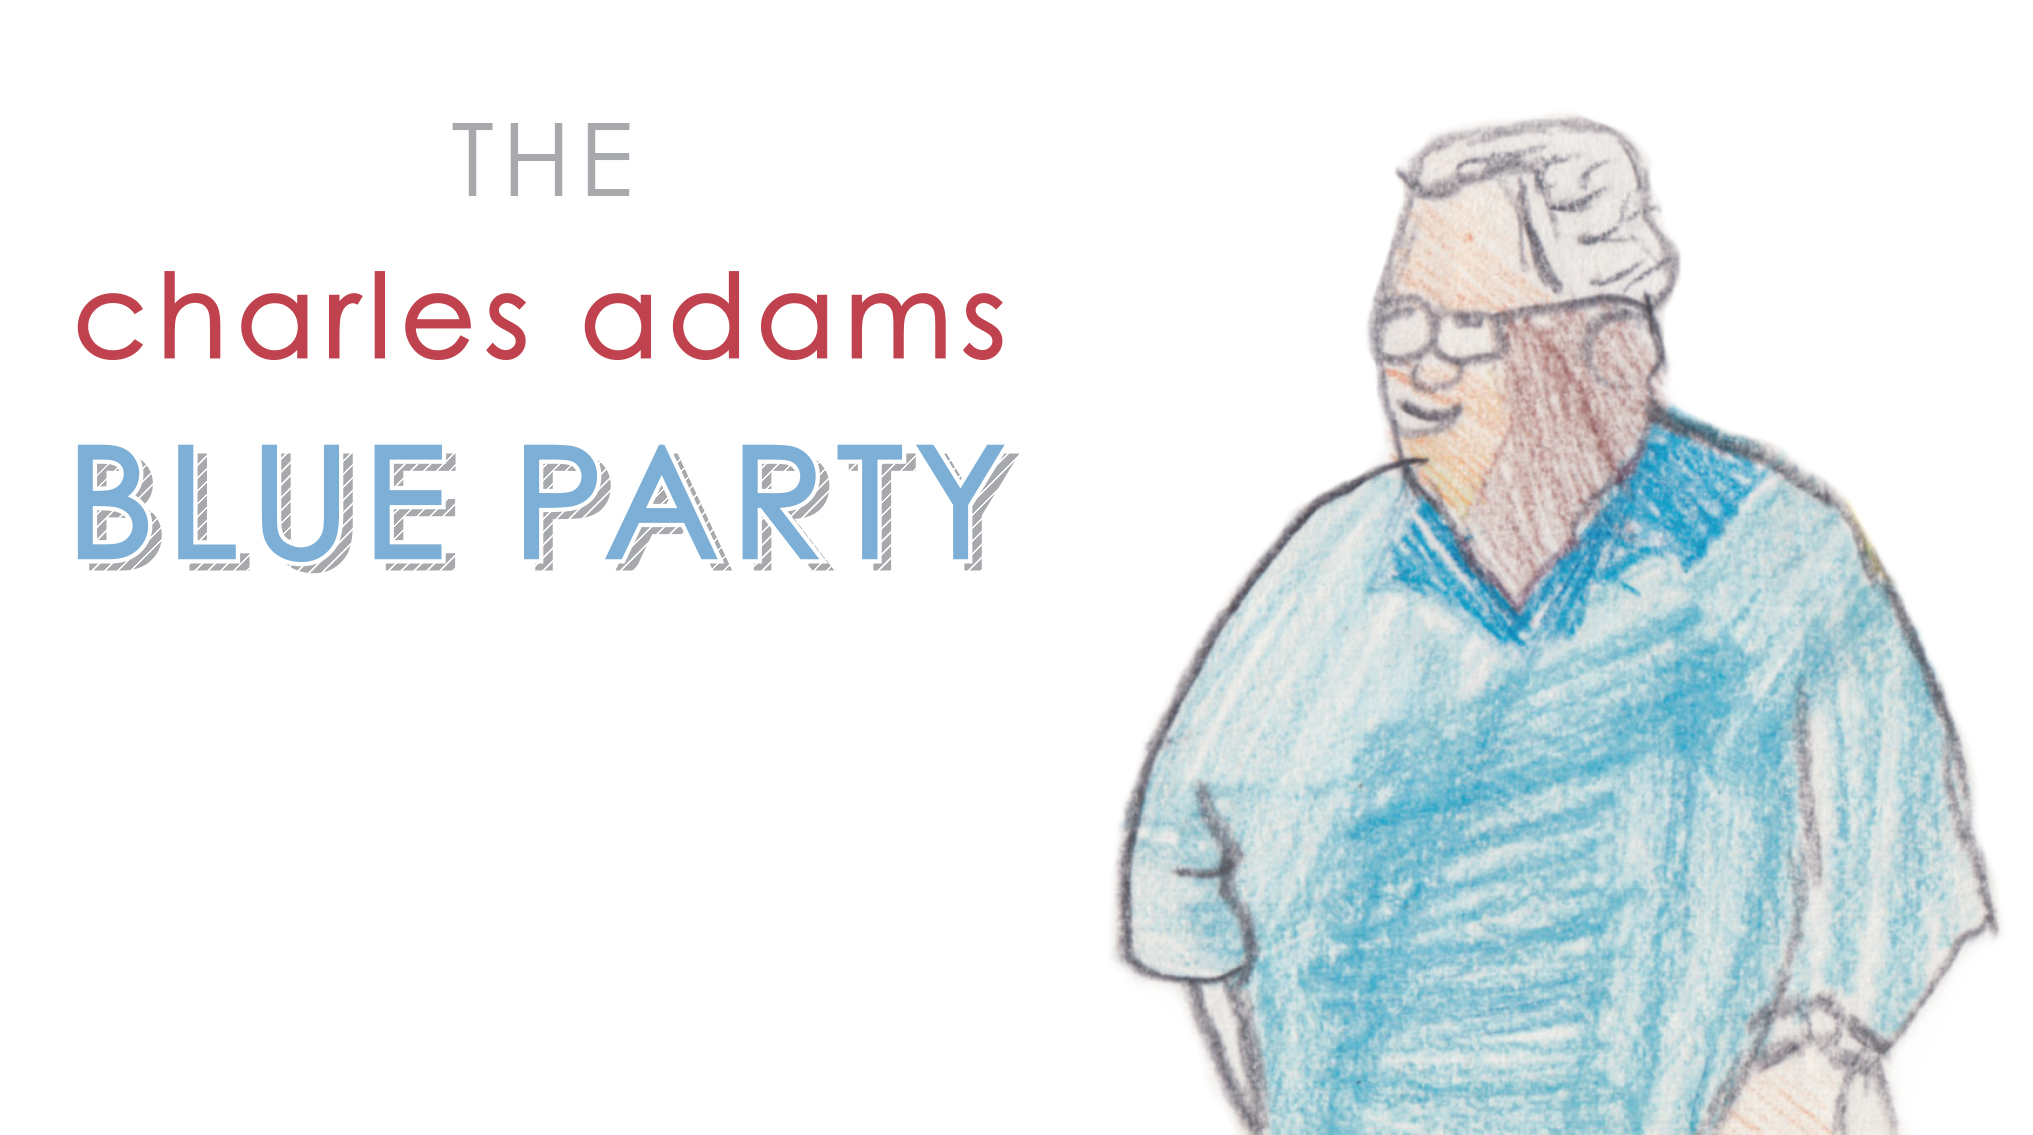 blue party illustration.jpg